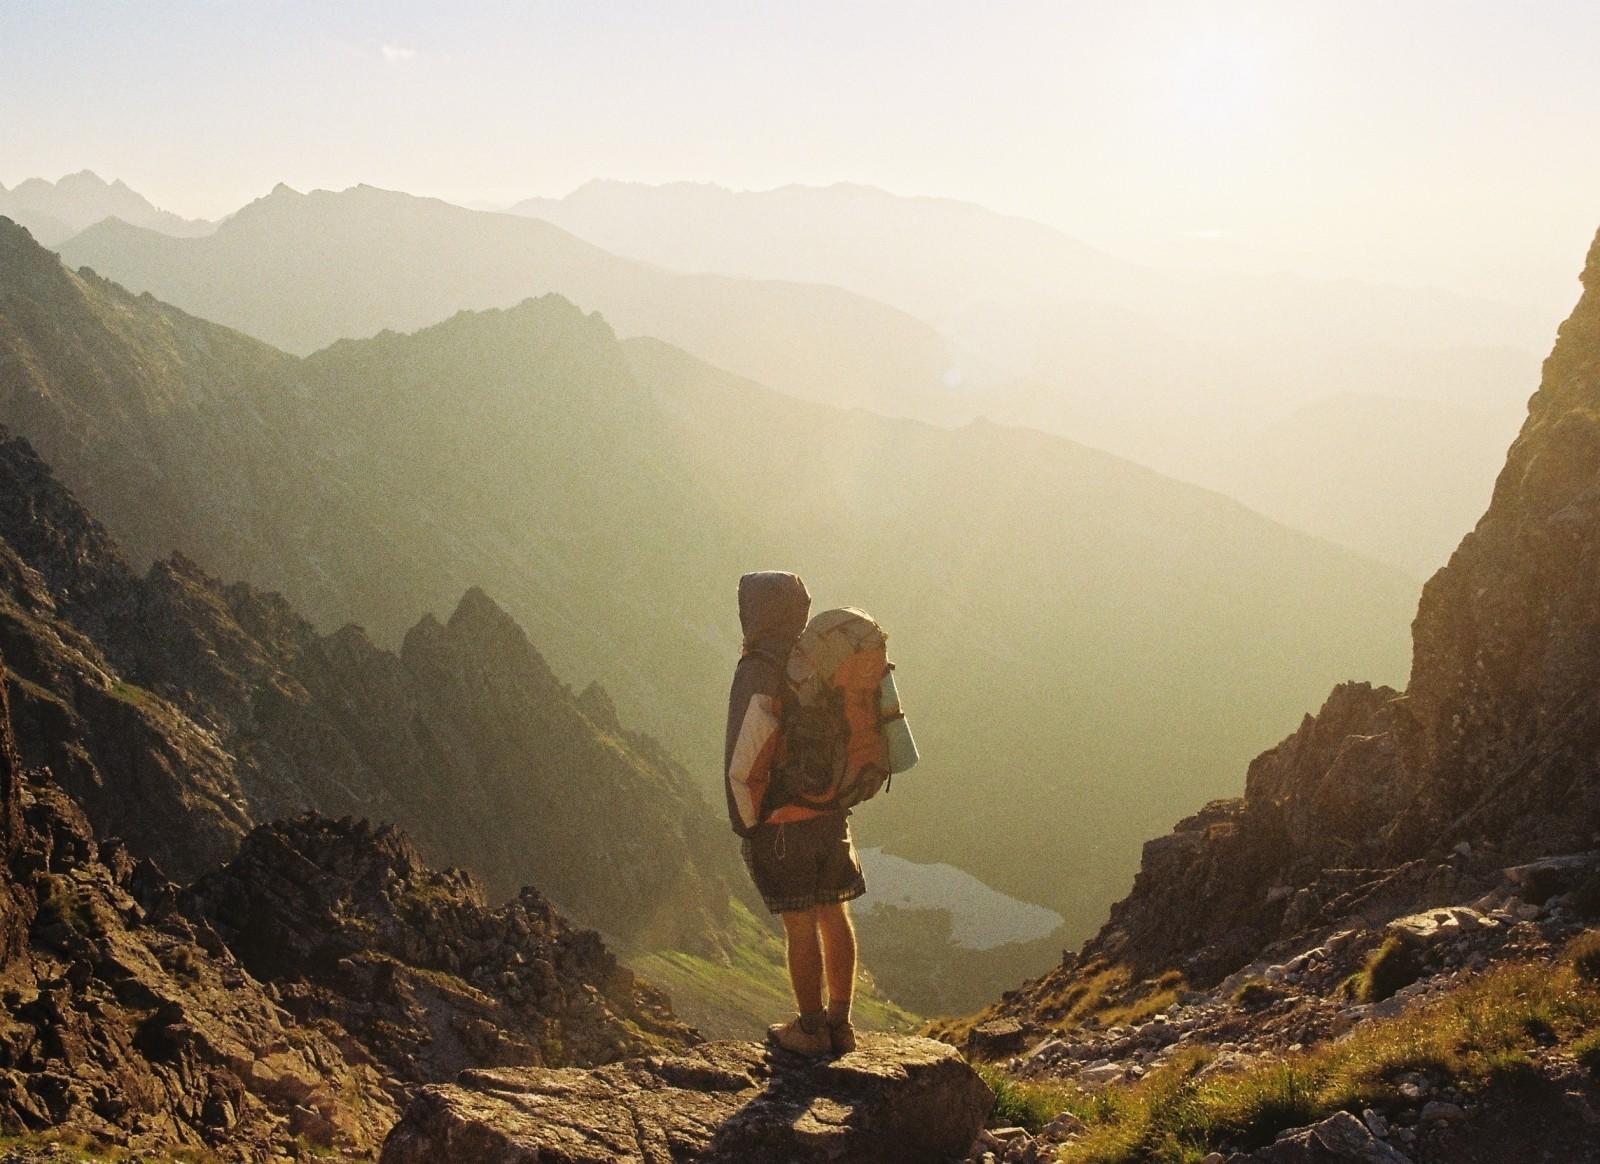 hiking-wilderness-mountains